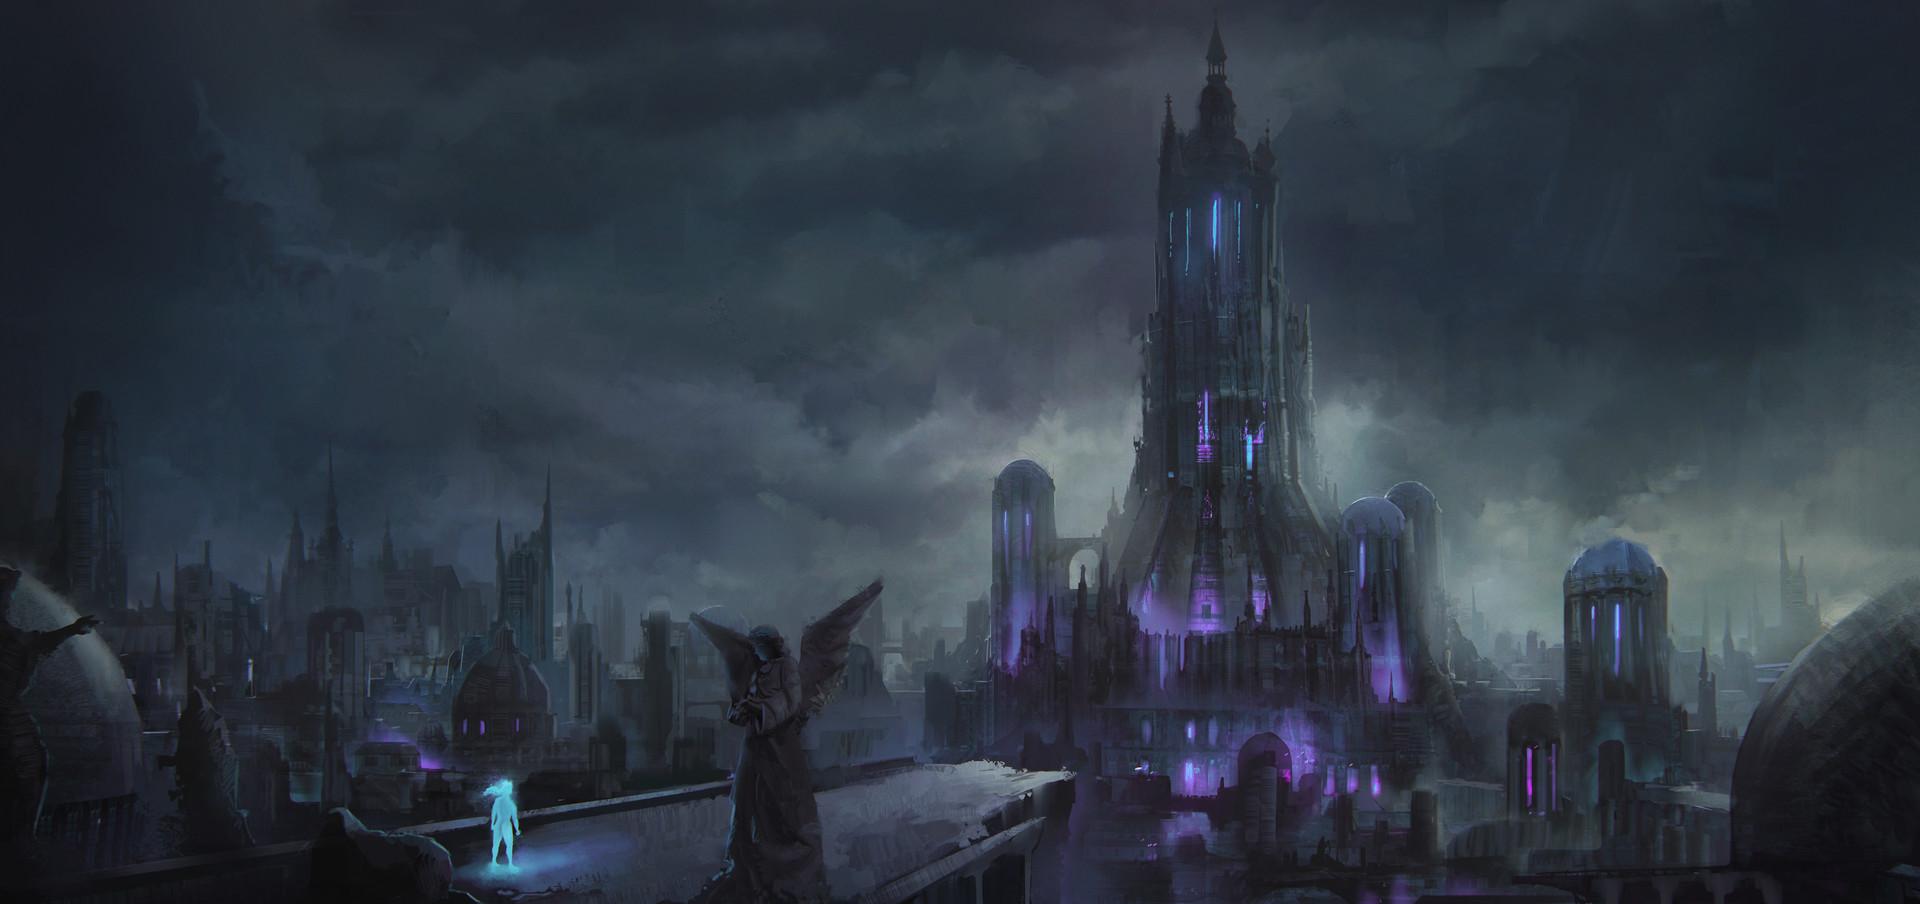 Leon tukker city purpleas